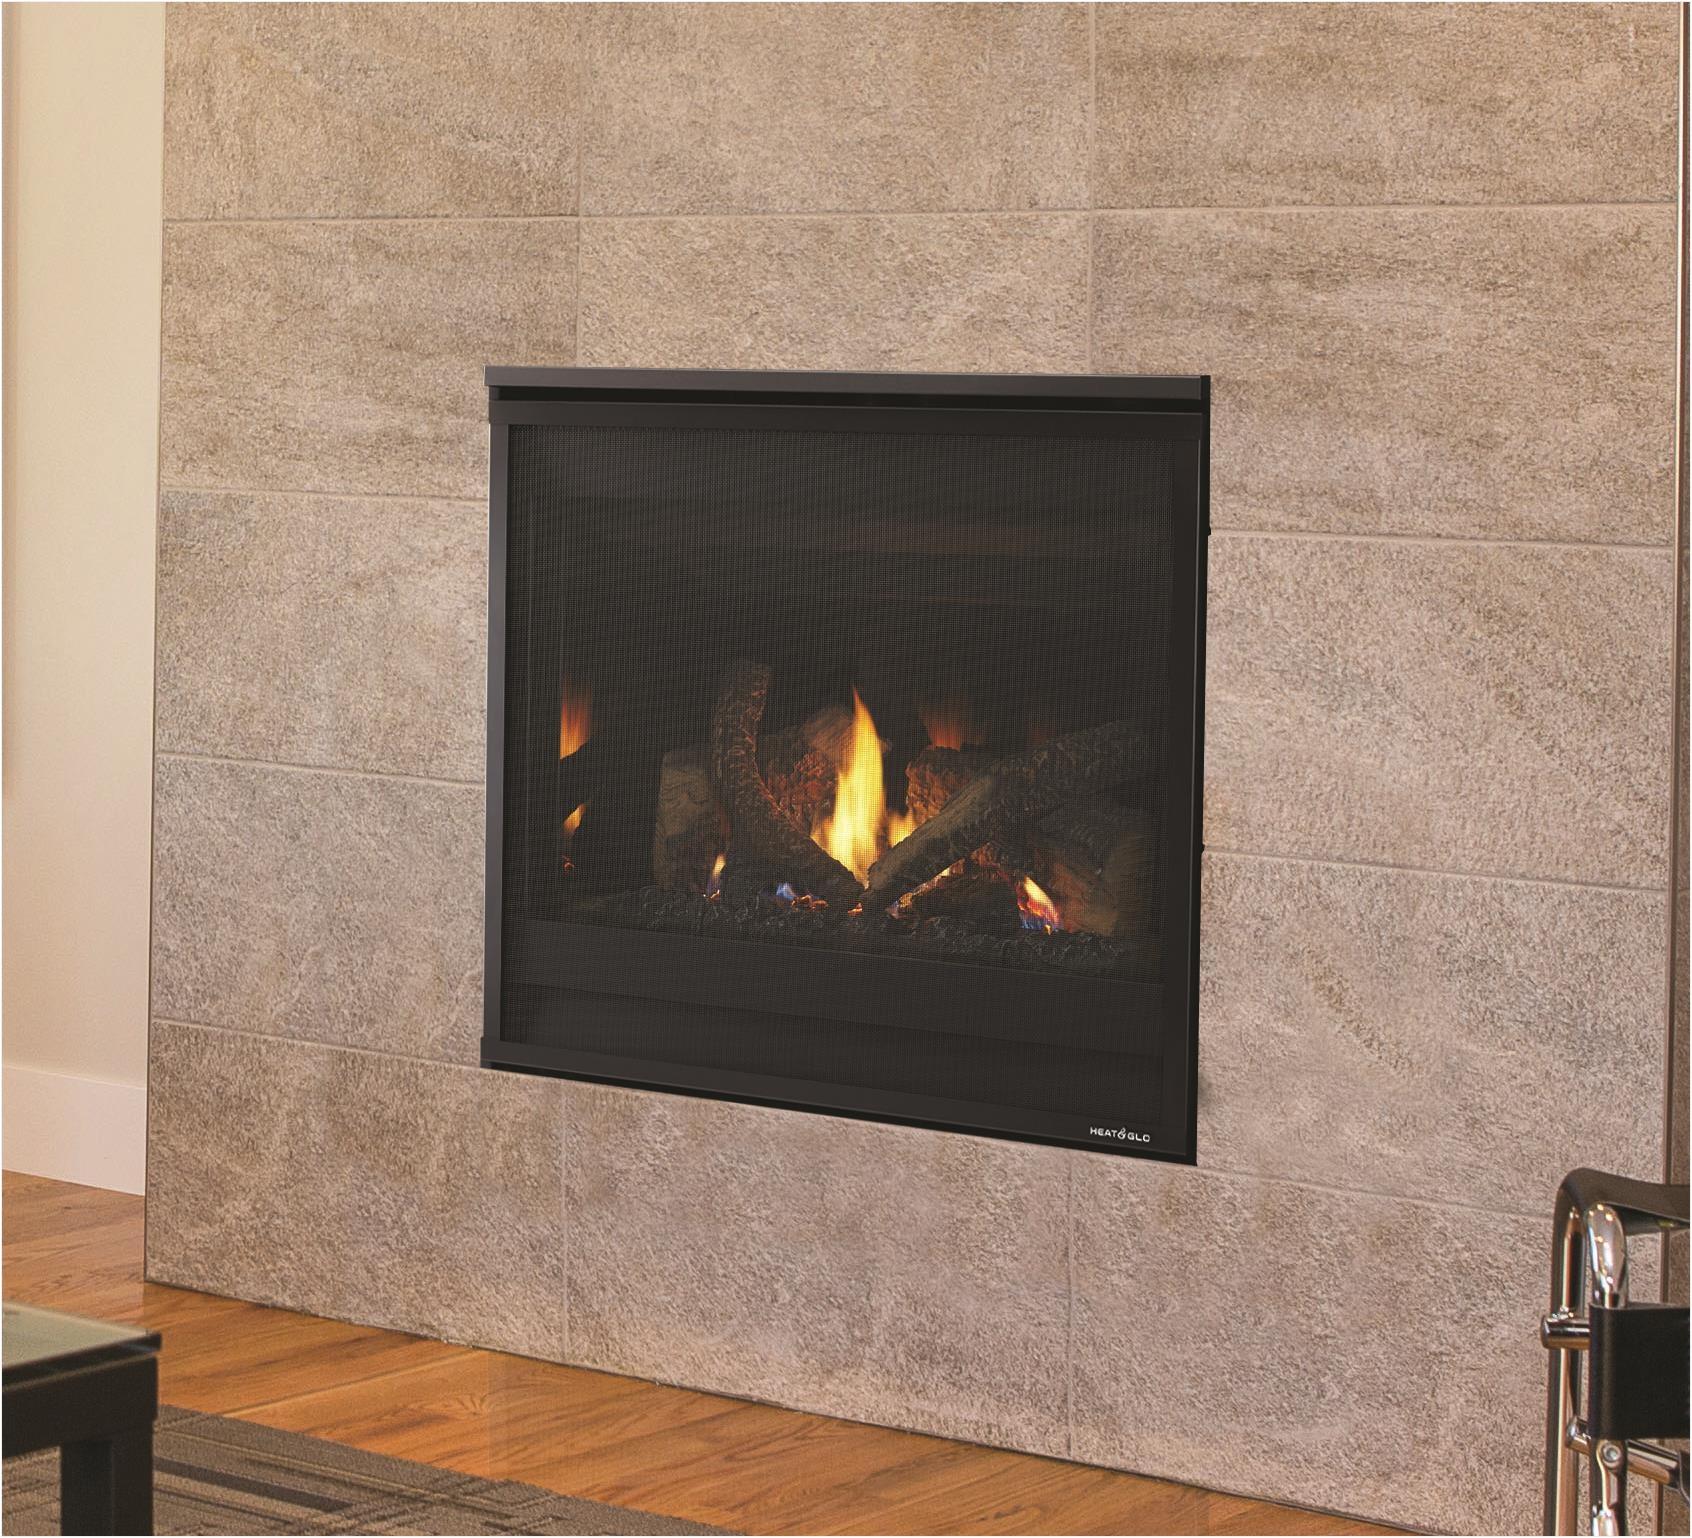 heat glo fireplace fan fresh amazing about gas fireplaces gas fireplaces gas fireplace